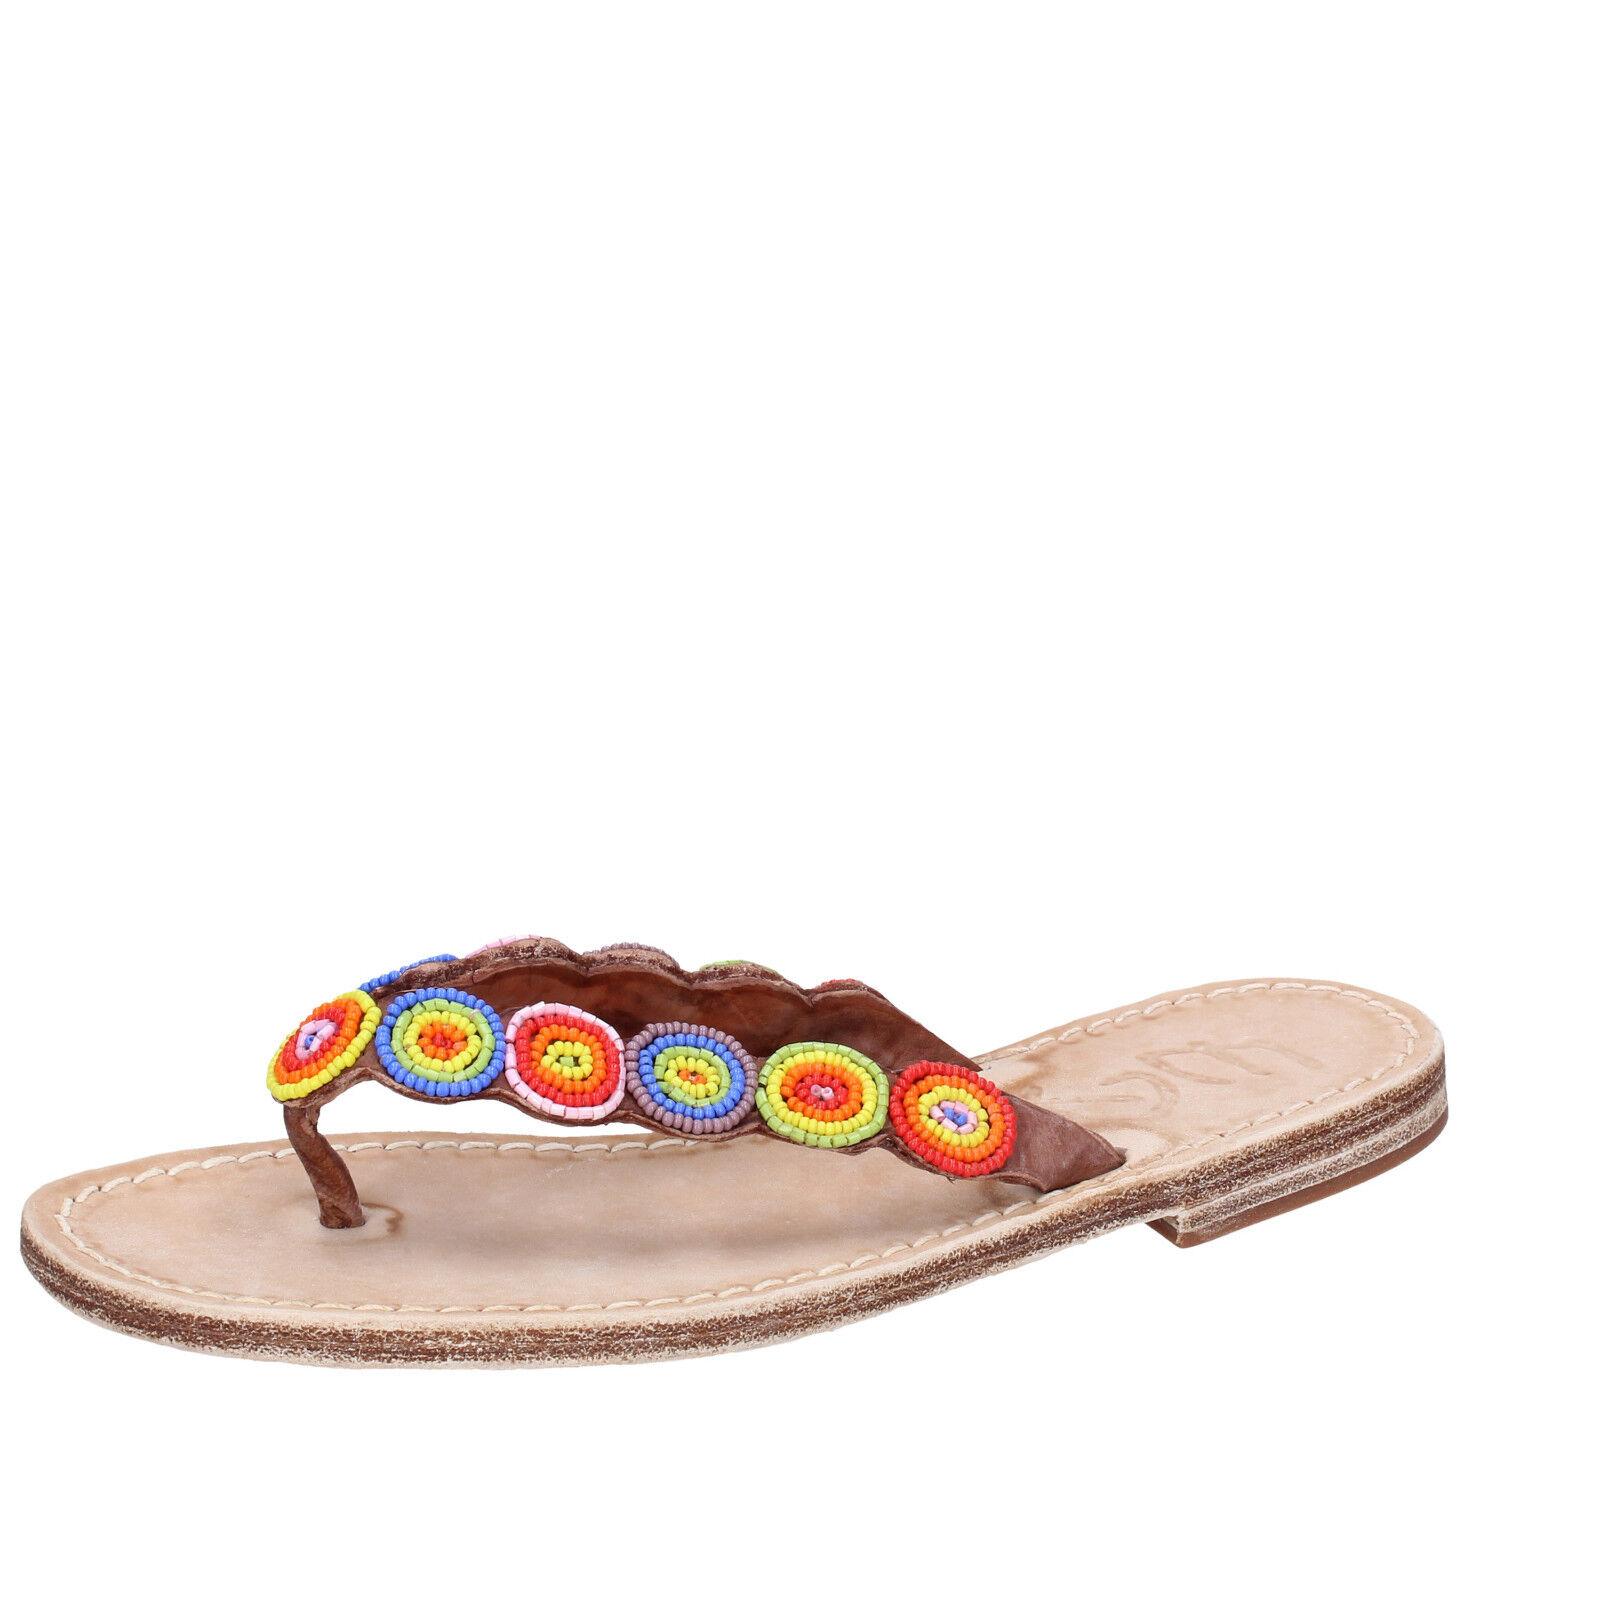 Damenss schuhe EDDY DANIELE 4 (EU 37) Sandales multicolor Leder AW298